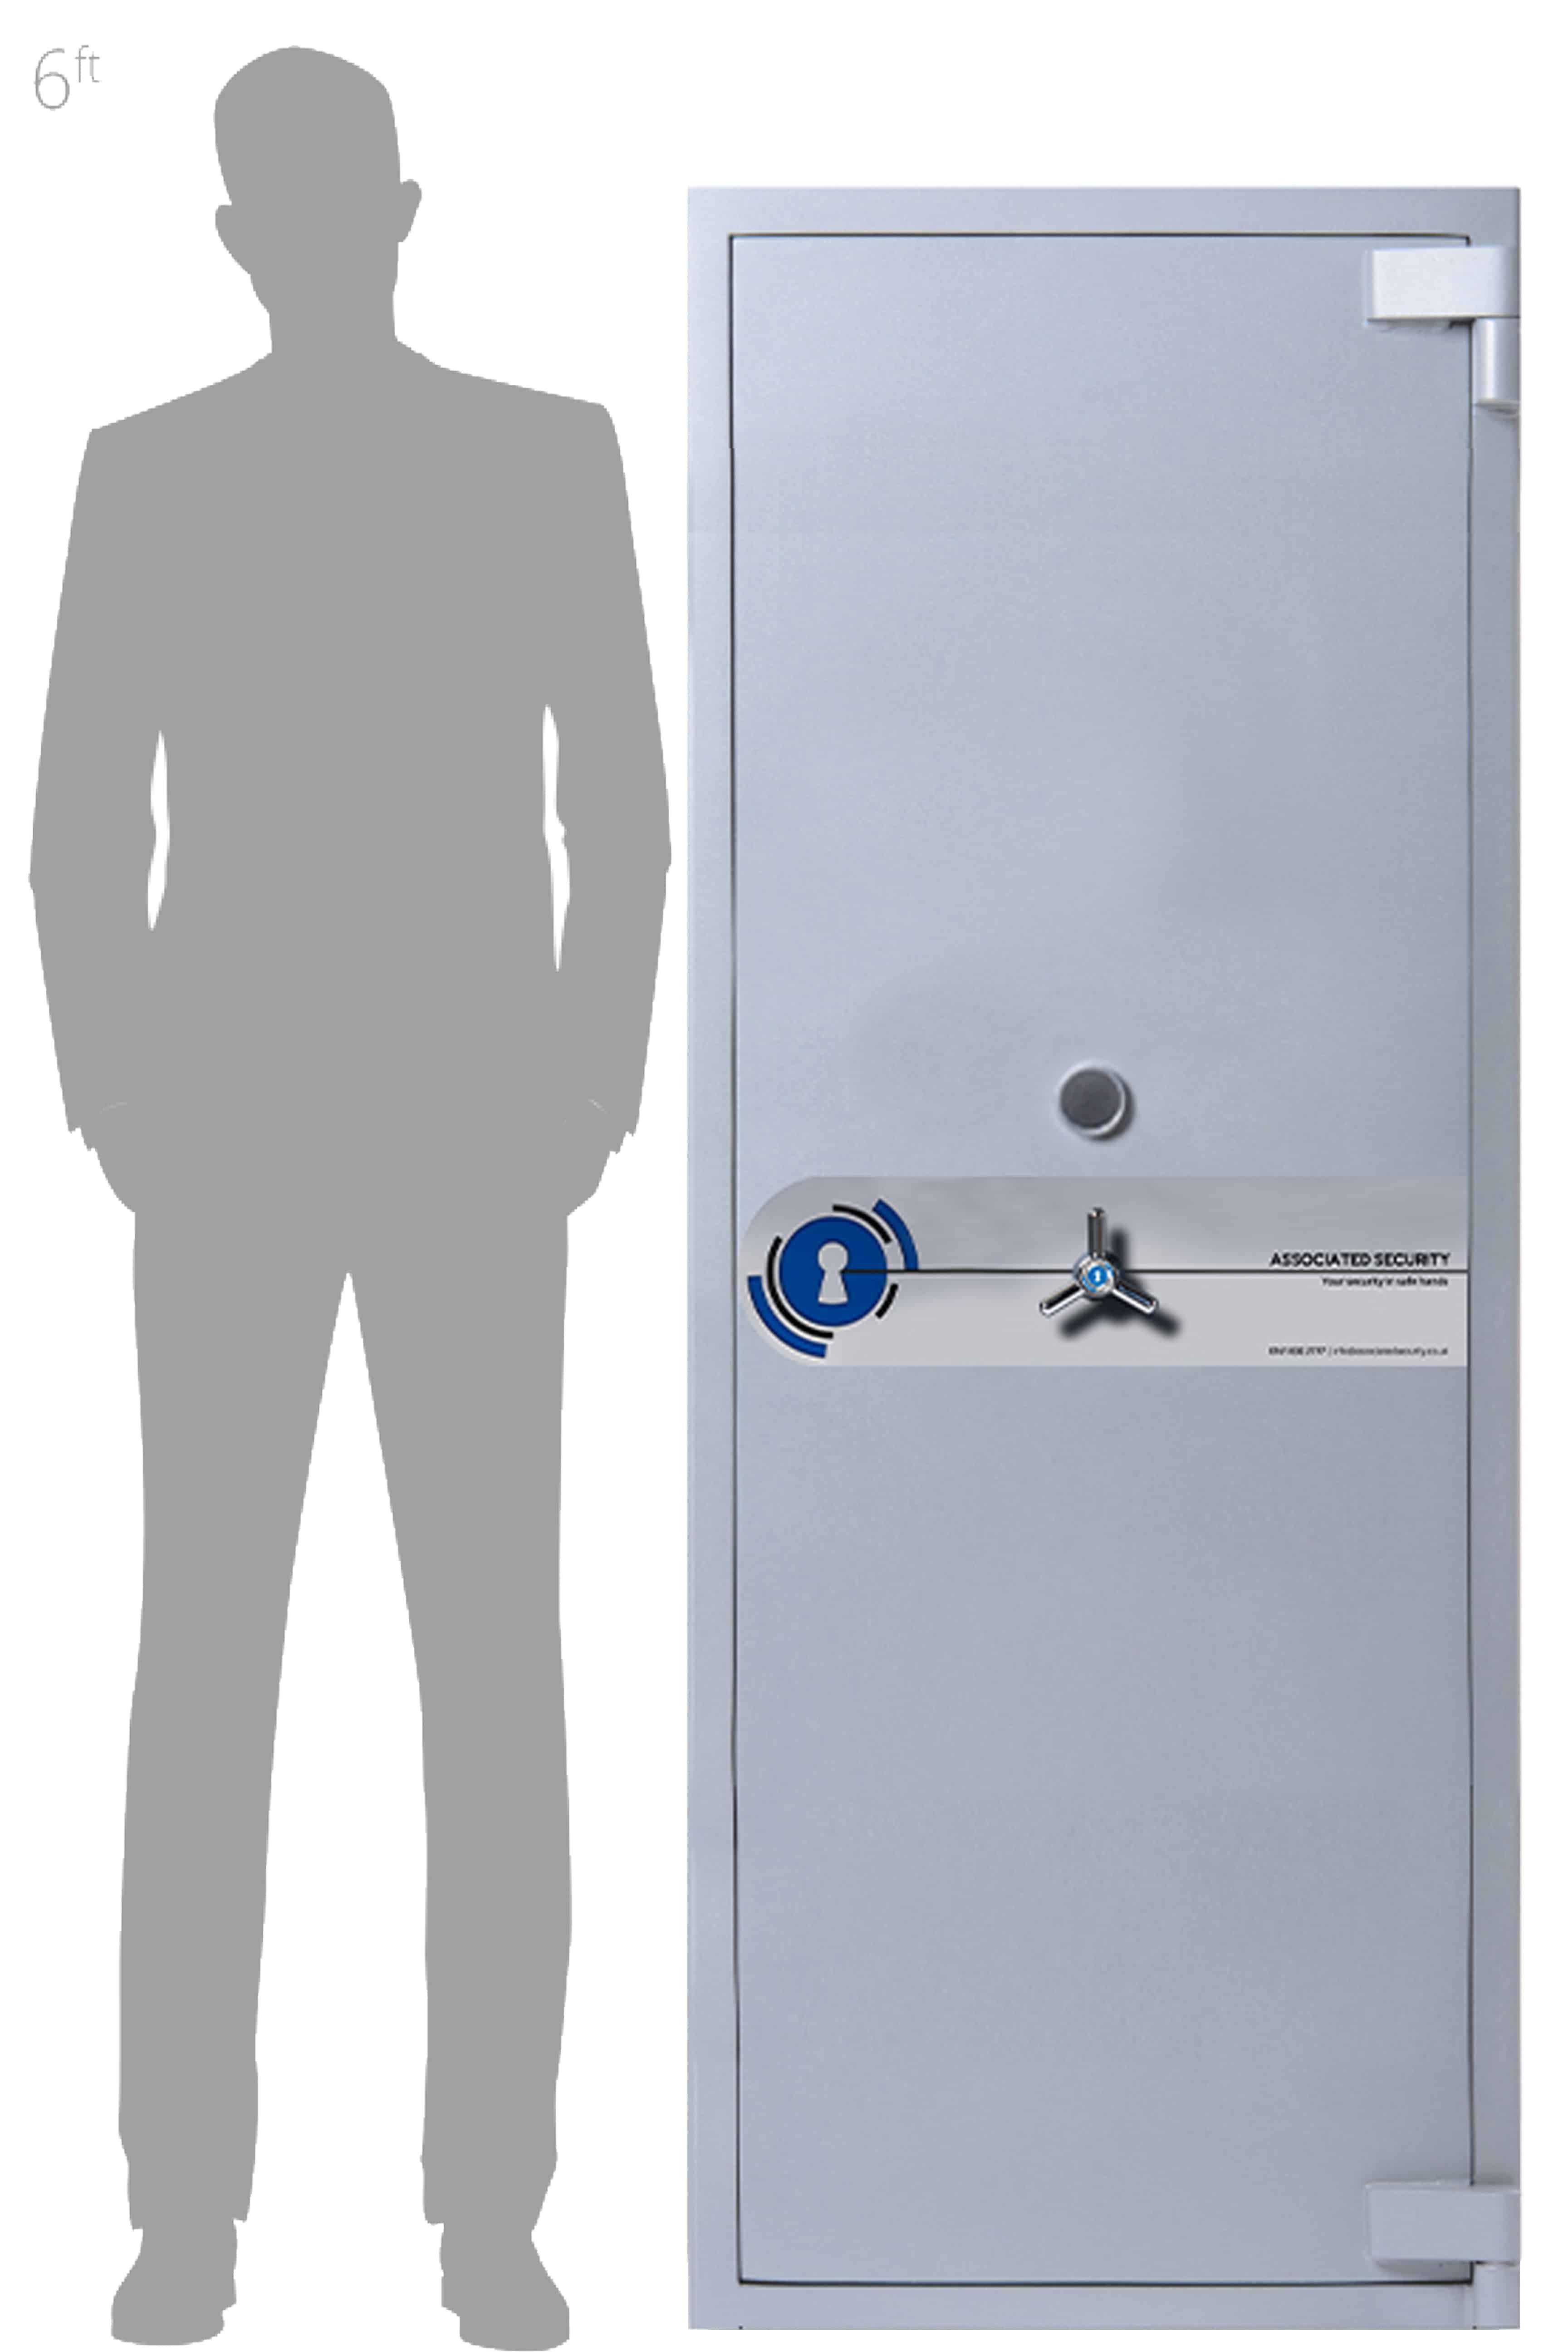 Associated-Security- AiS-Insurance-Approved-safes-graded safes- eurograde safes - cash safes - home safes - business safes